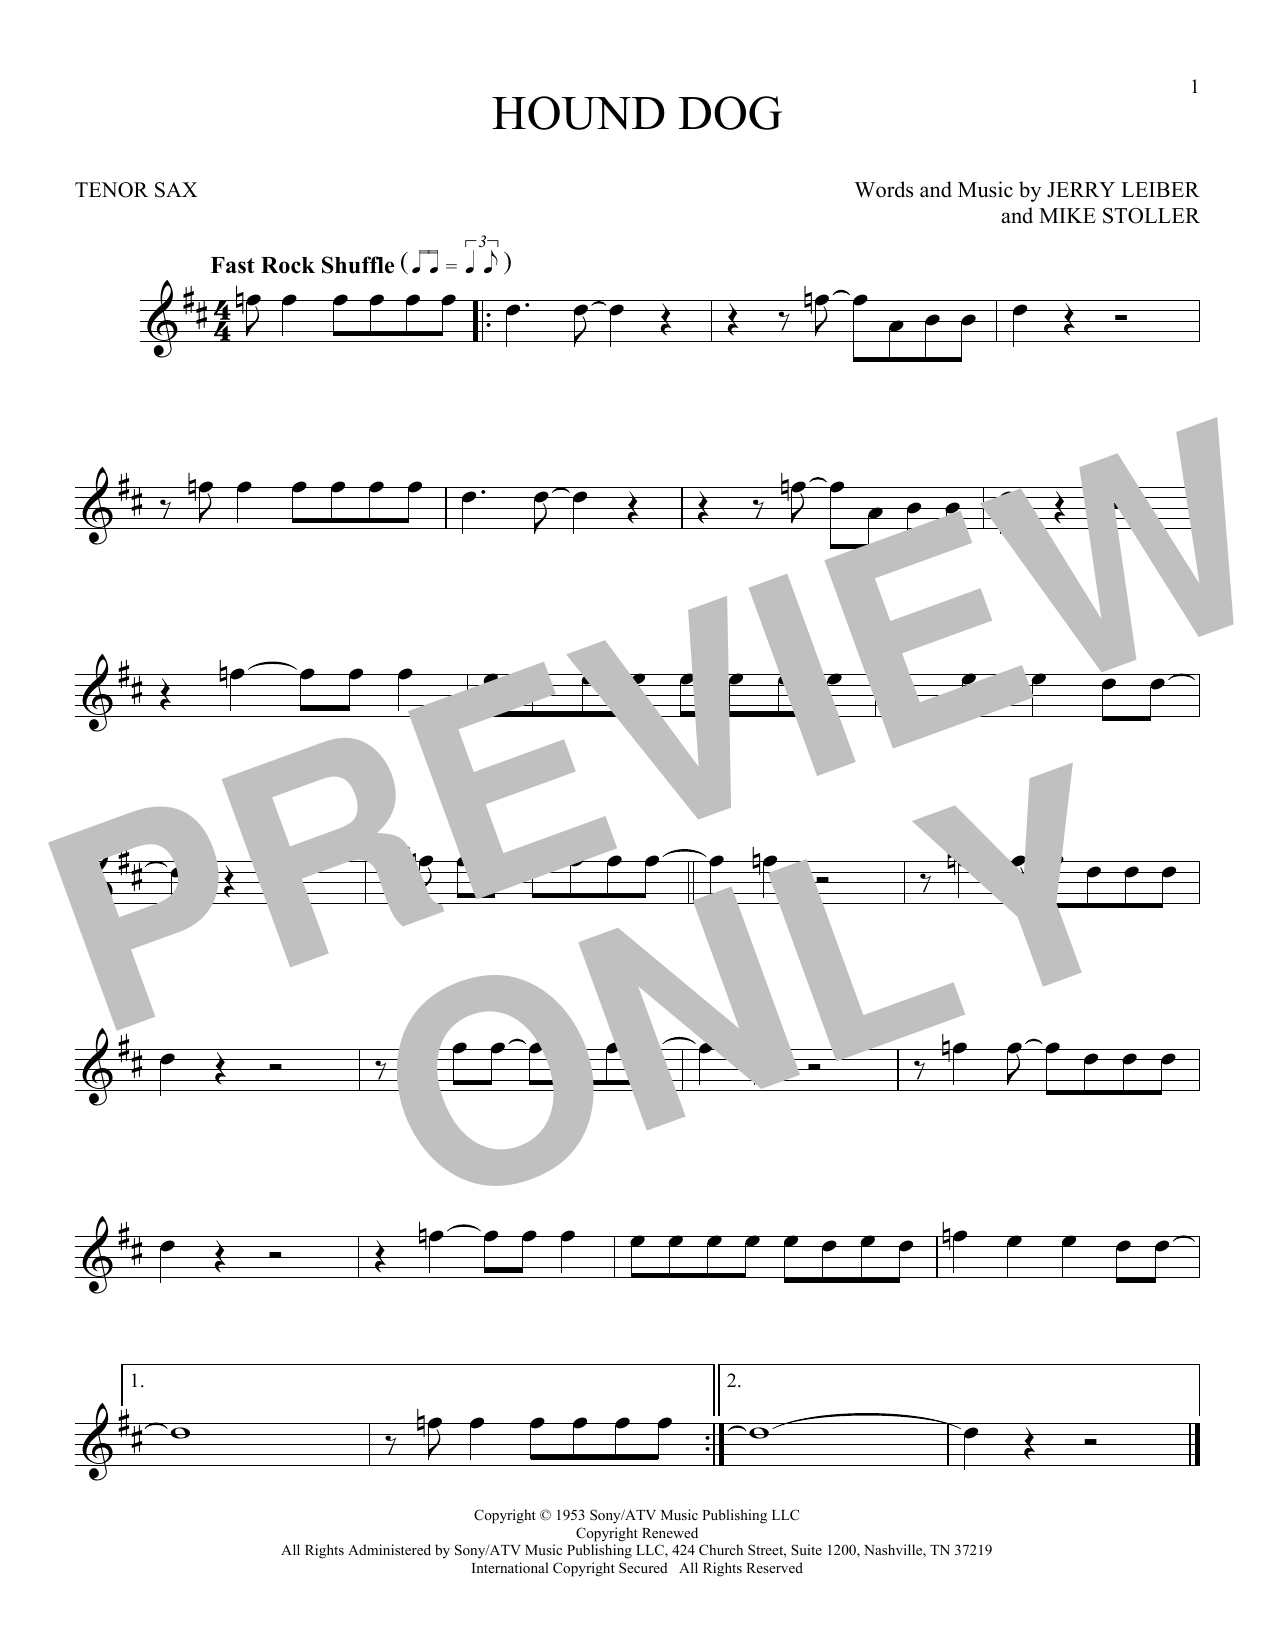 Hound Dog (Tenor Sax Solo)